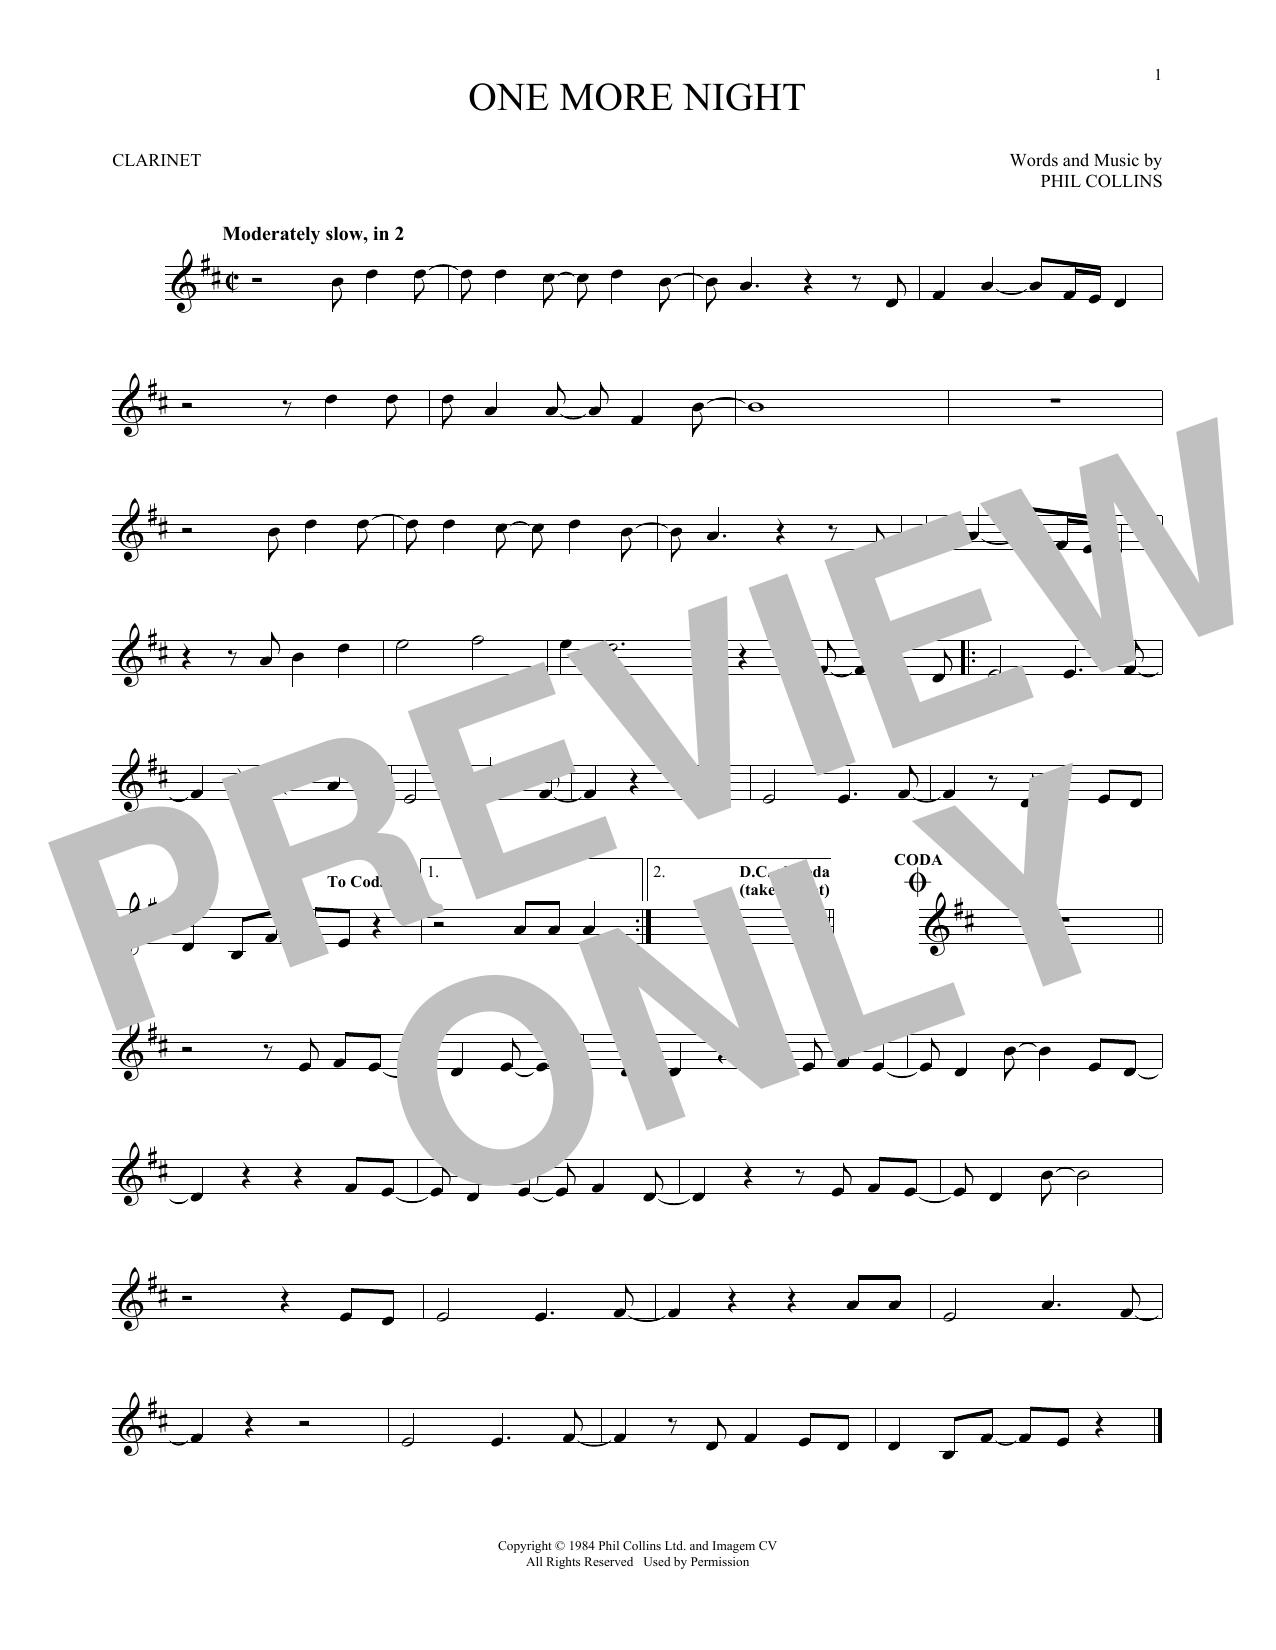 One More Night (Clarinet)